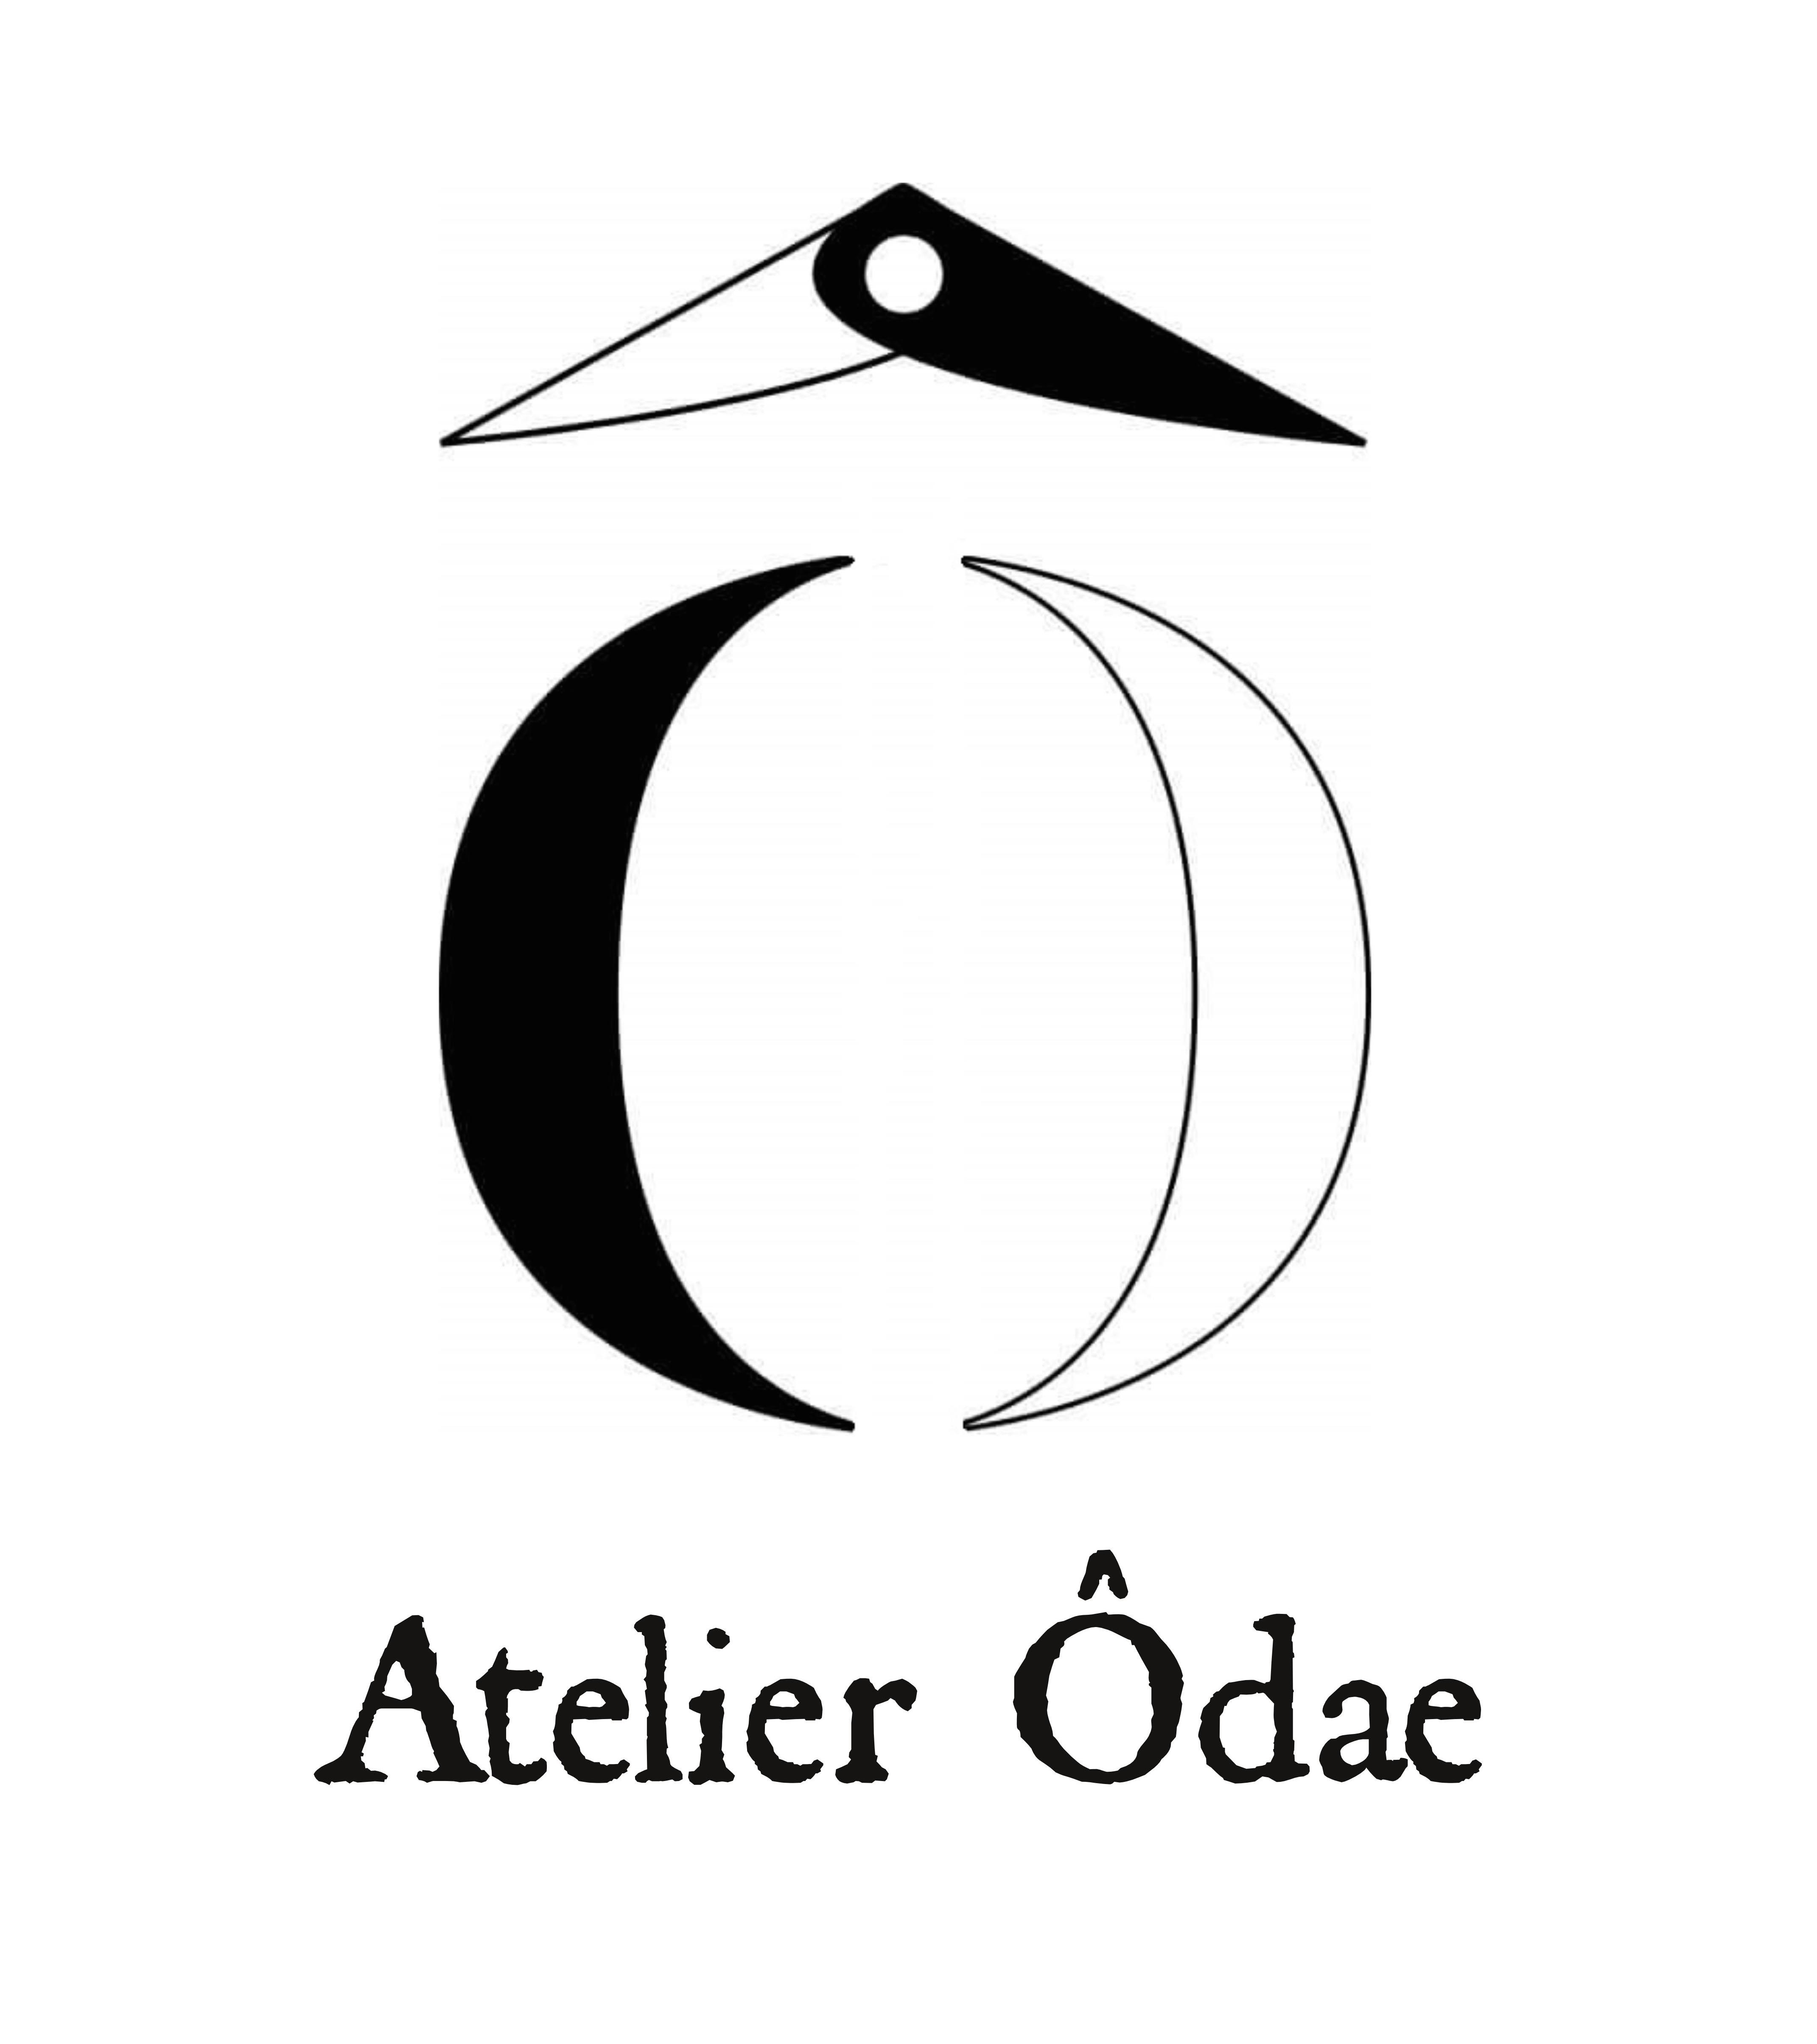 Atelier Ôdae Pierre Thomas knives